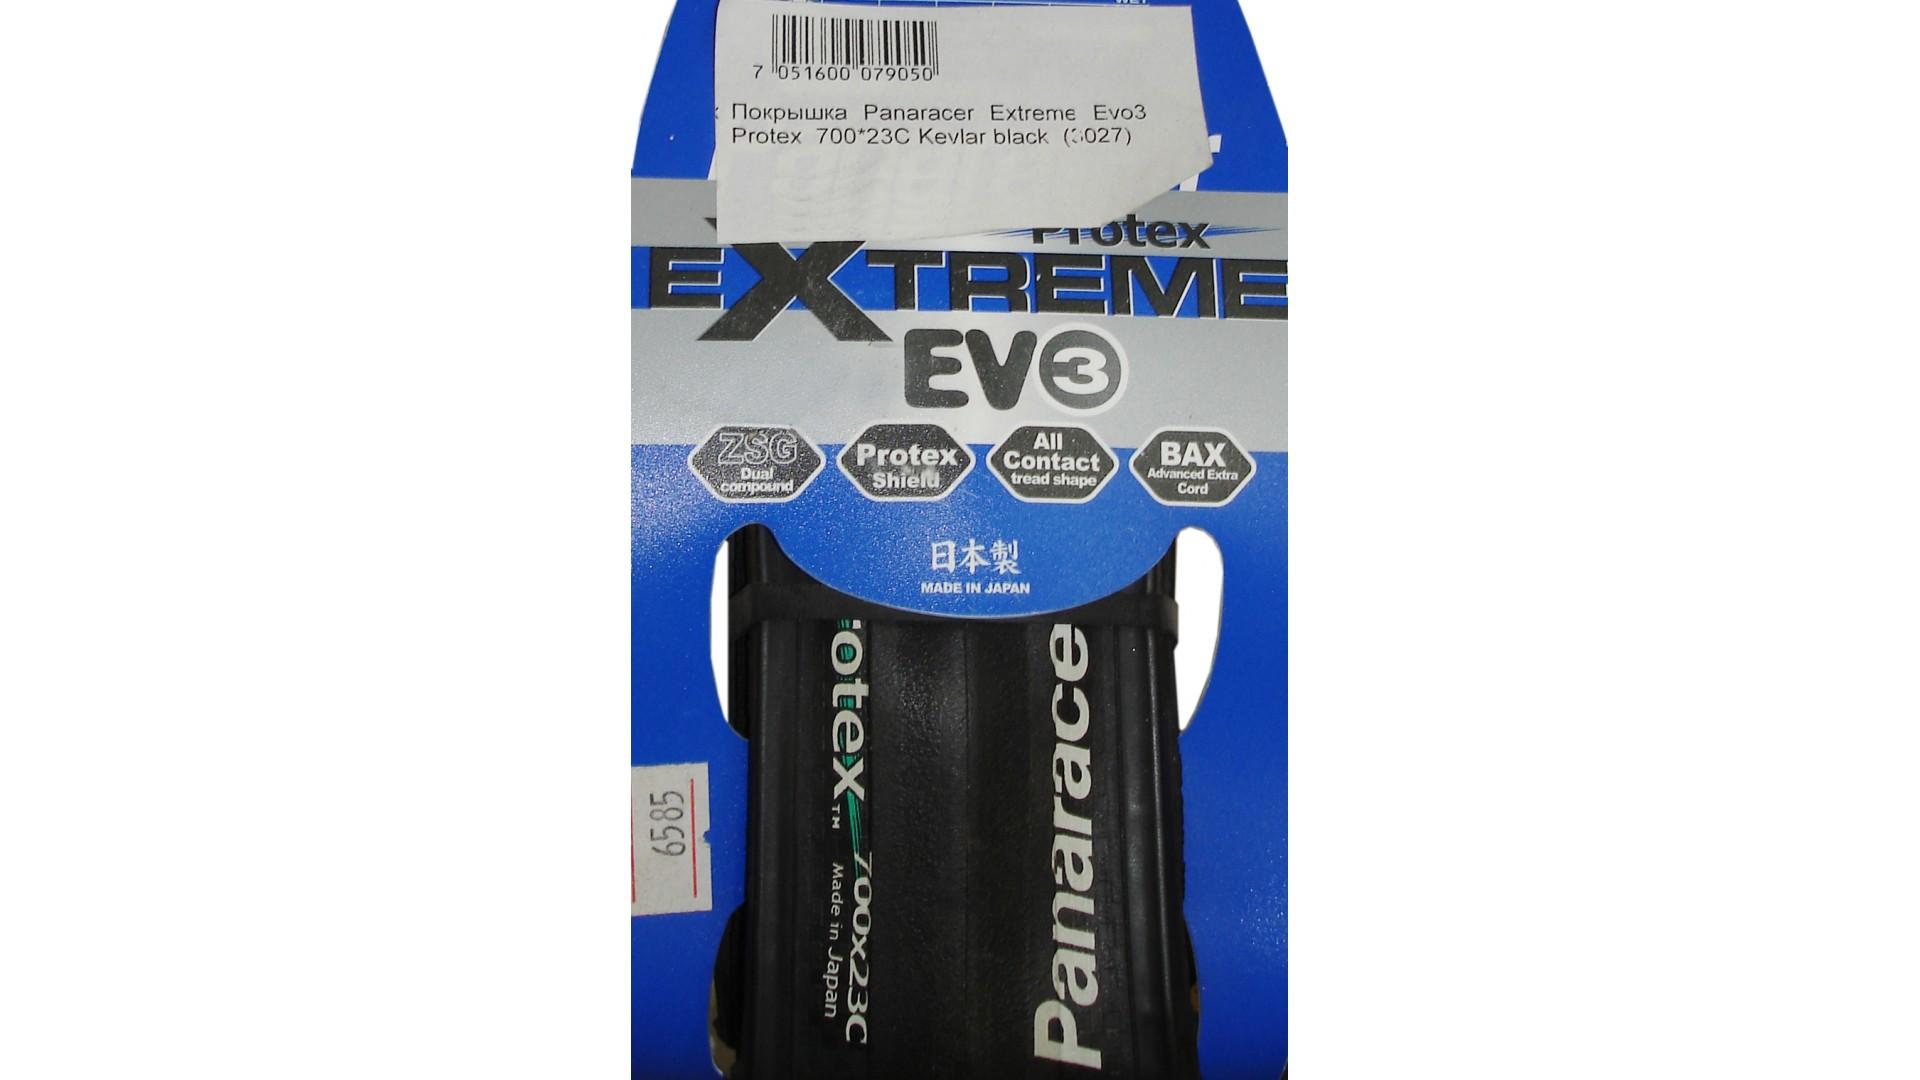 Покрышка Panaracer Extreme Evo3 Protex 700*23C Kevlar black